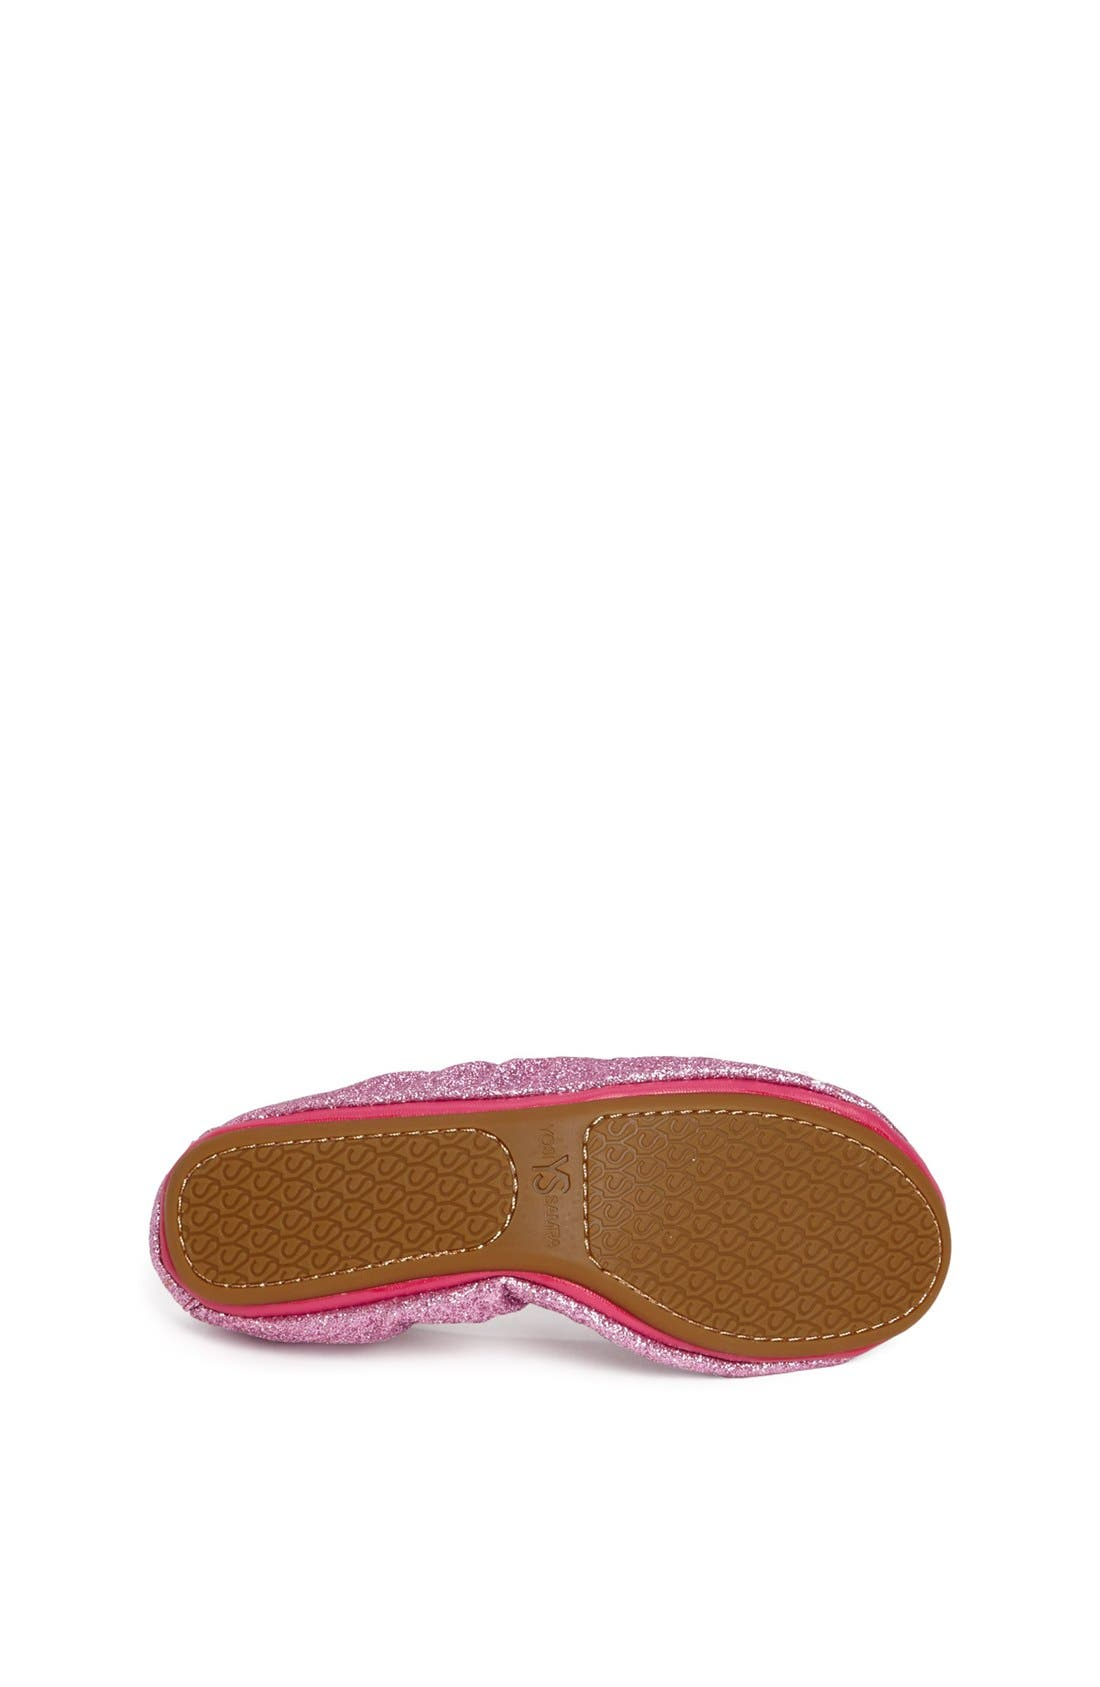 Alternate Image 4  - Yosi Samra Glitter Foldable Ballet Flat (Toddler, Little Kid & Big Kid)